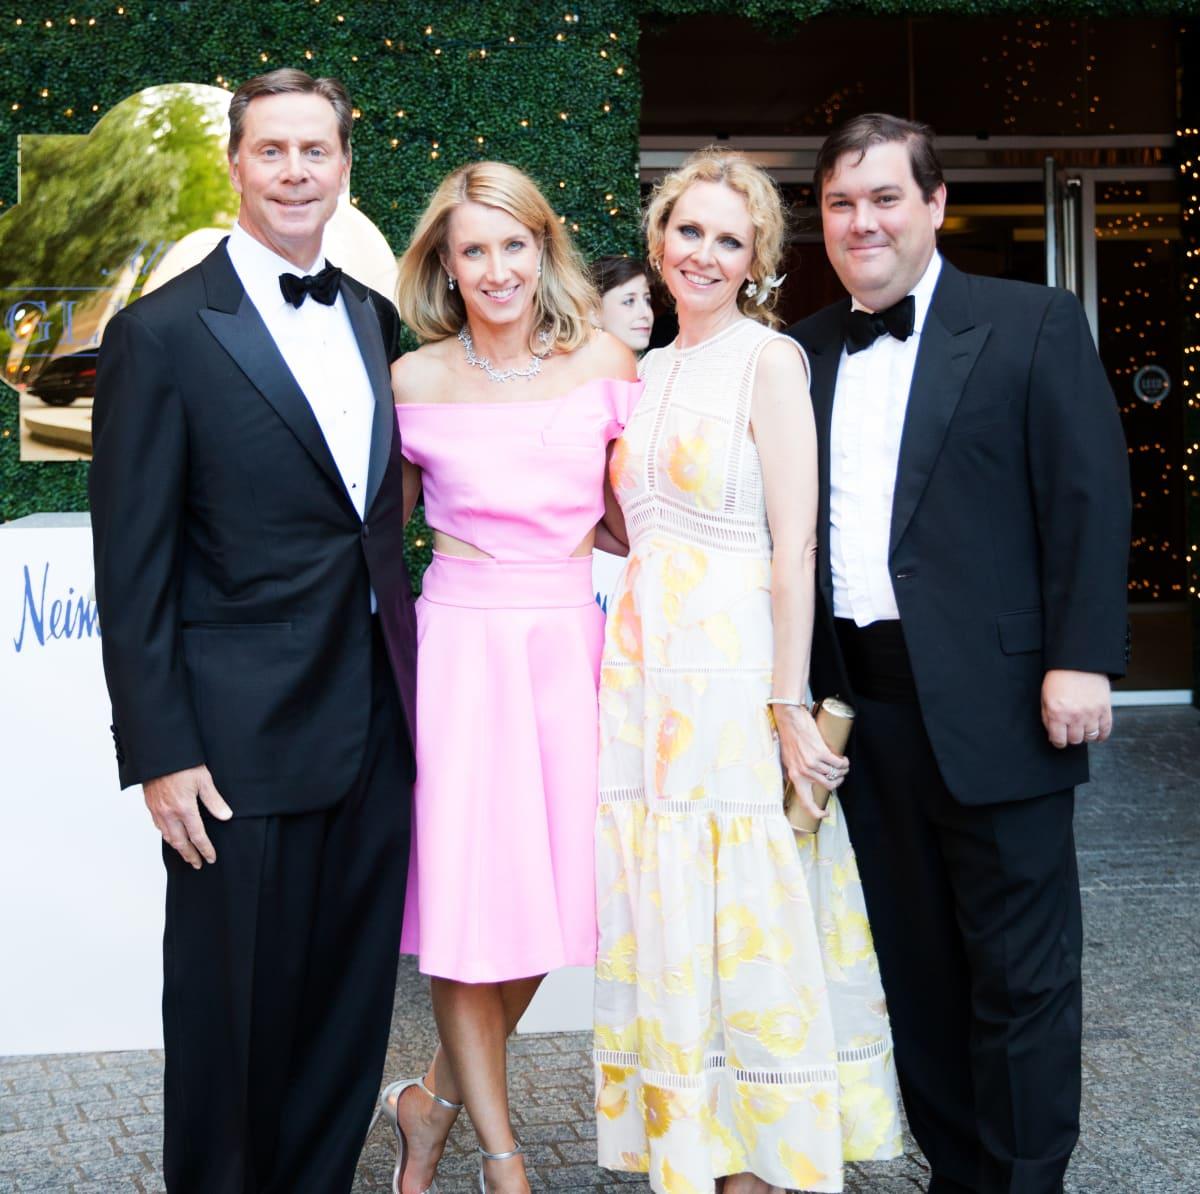 Lisa and John Rocchio, Hale and Deedee Hoak